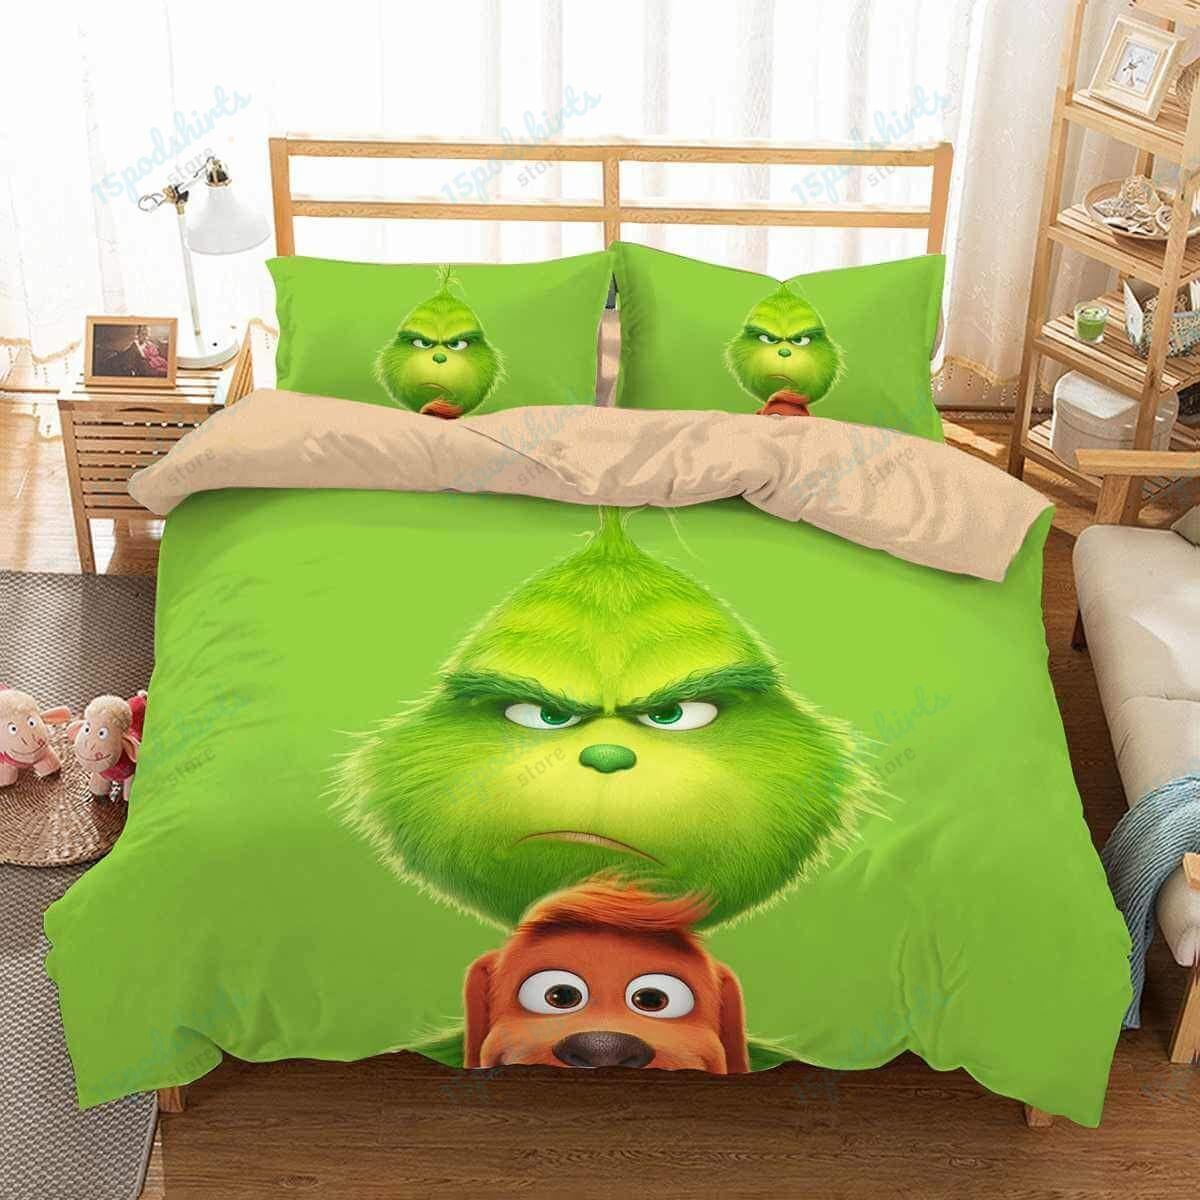 The Grinch 1 Duvet Cover Bedding Set